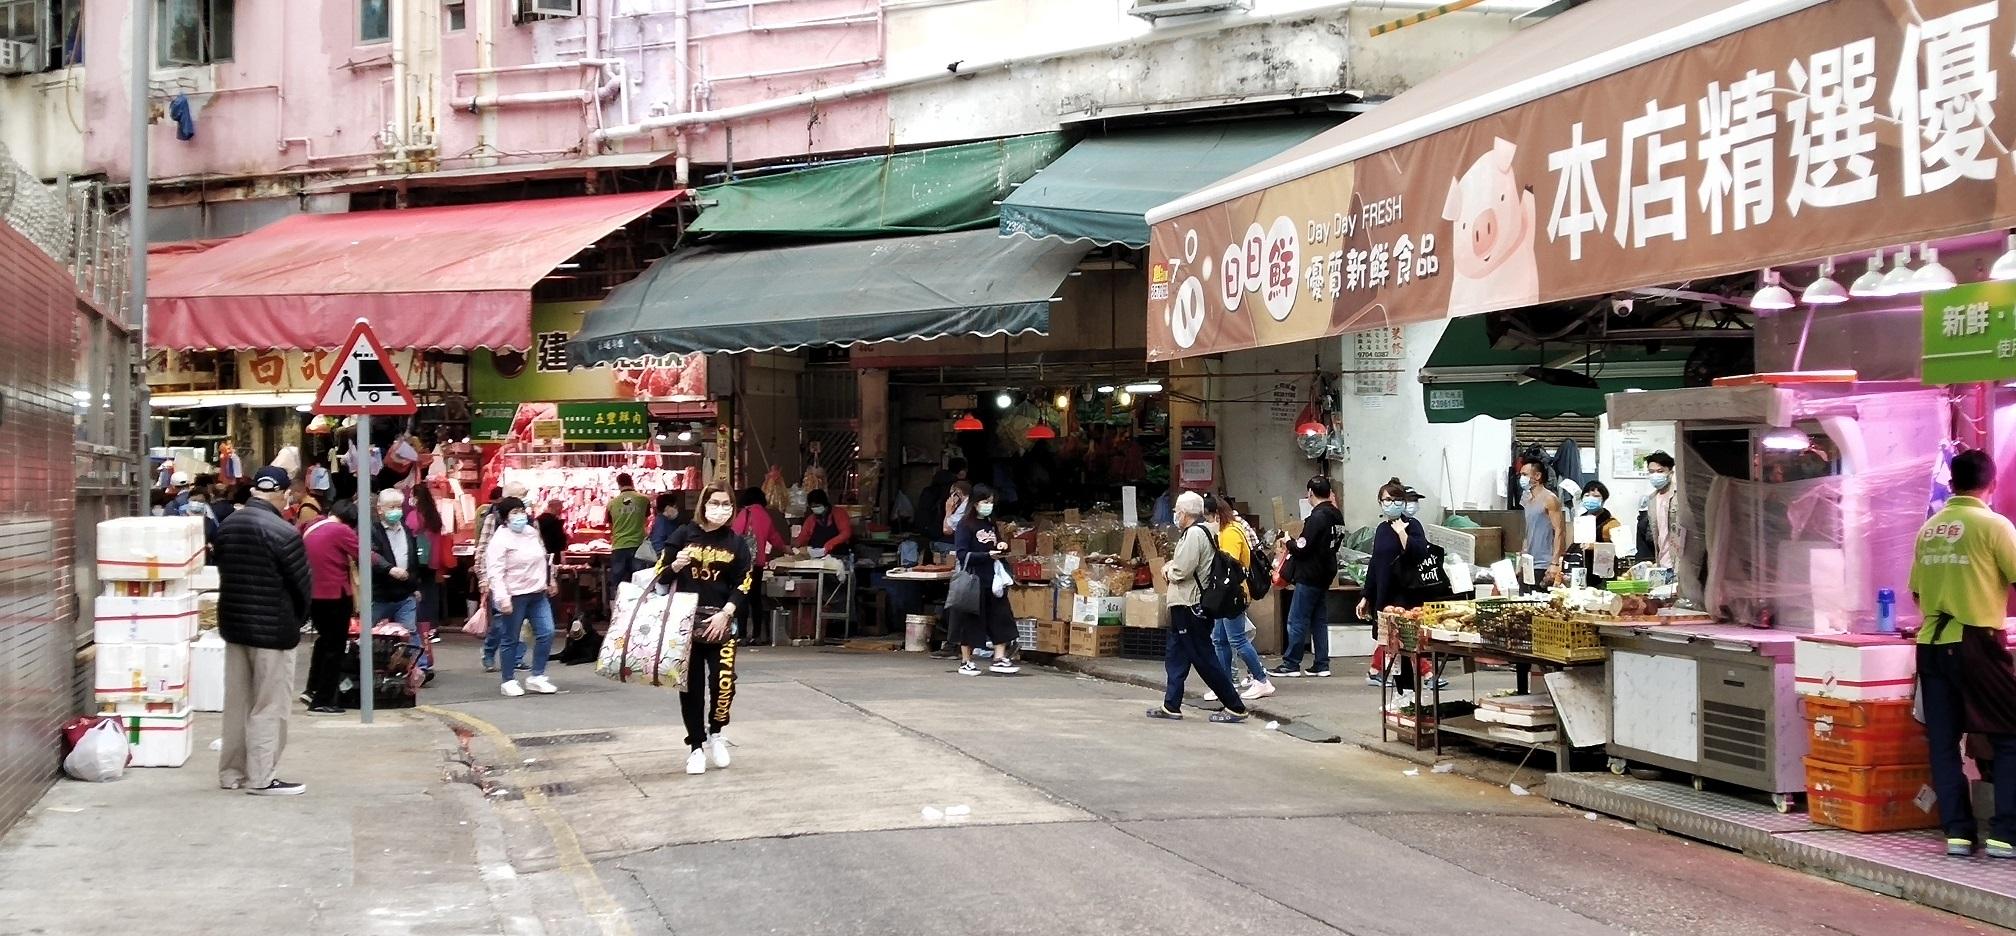 Sham Chun Street is short.